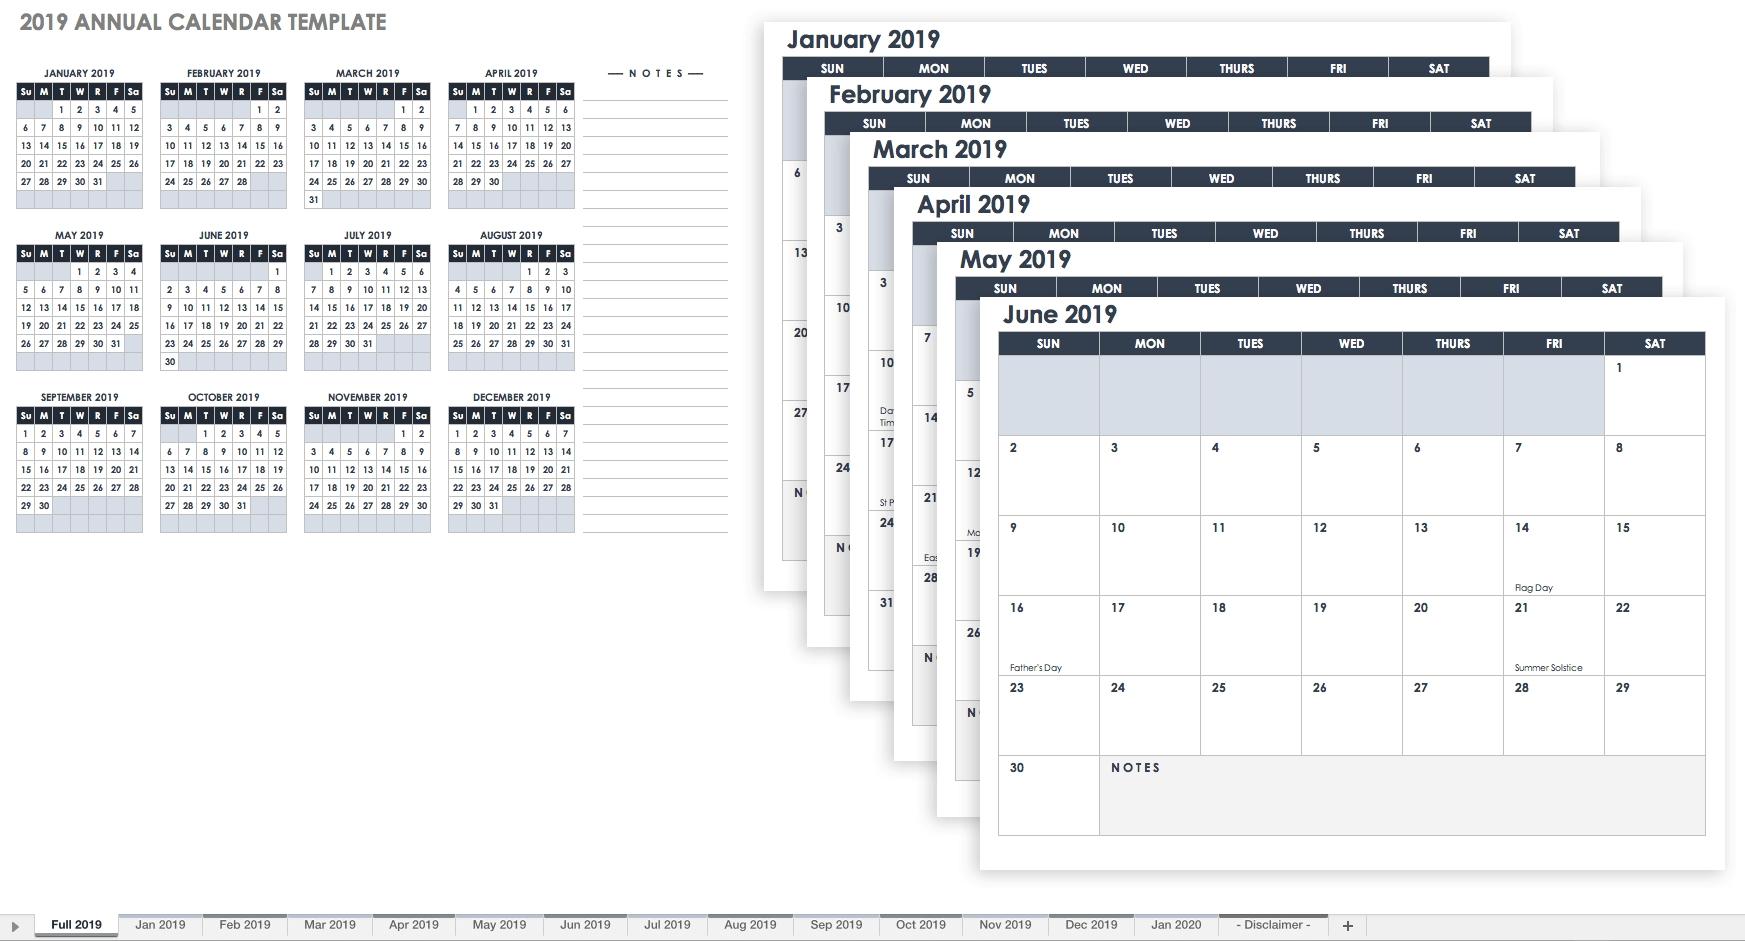 15 Free Monthly Calendar Templates | Smartsheet within Blank Monthly Calendar Printable Template